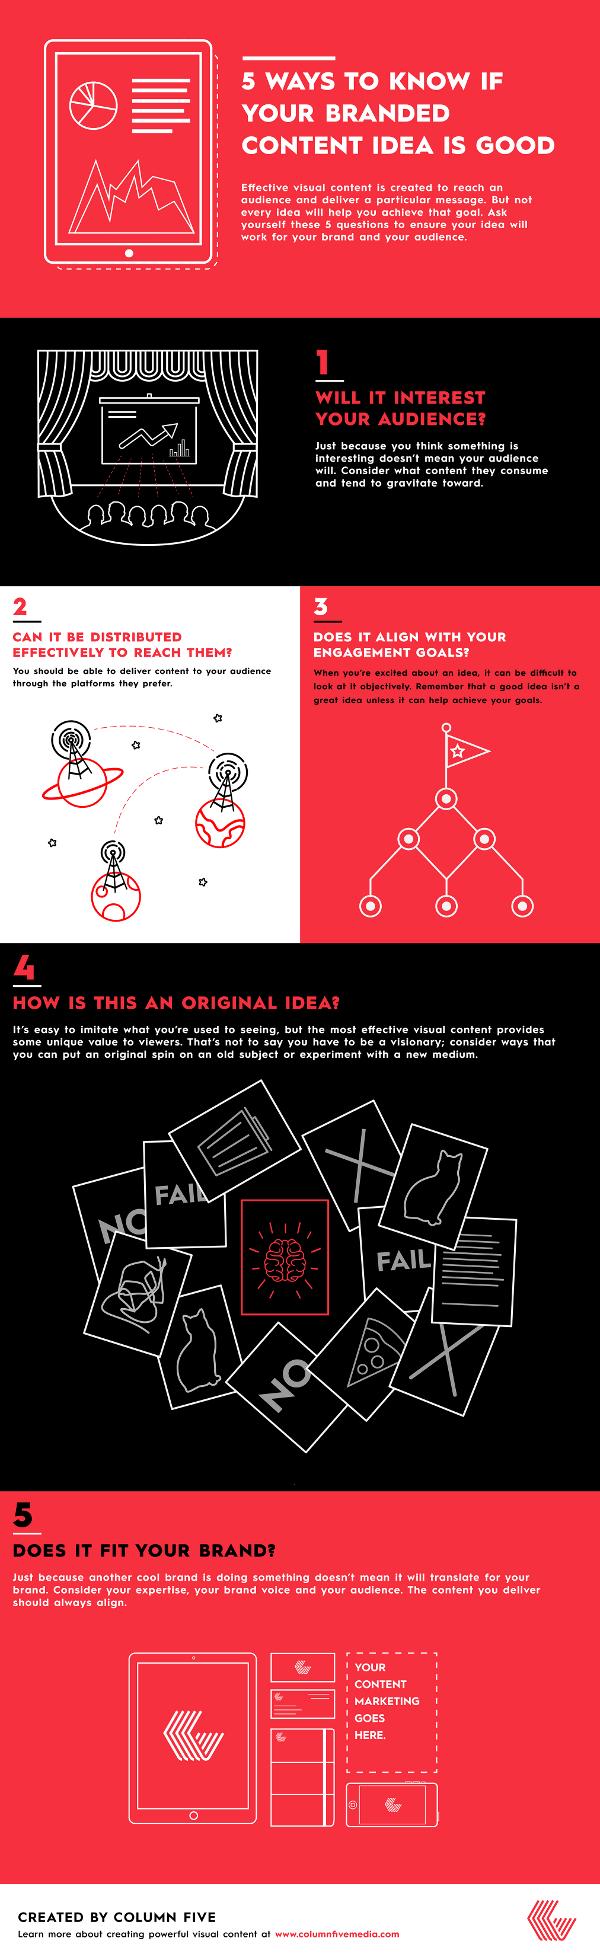 Brand content infographic